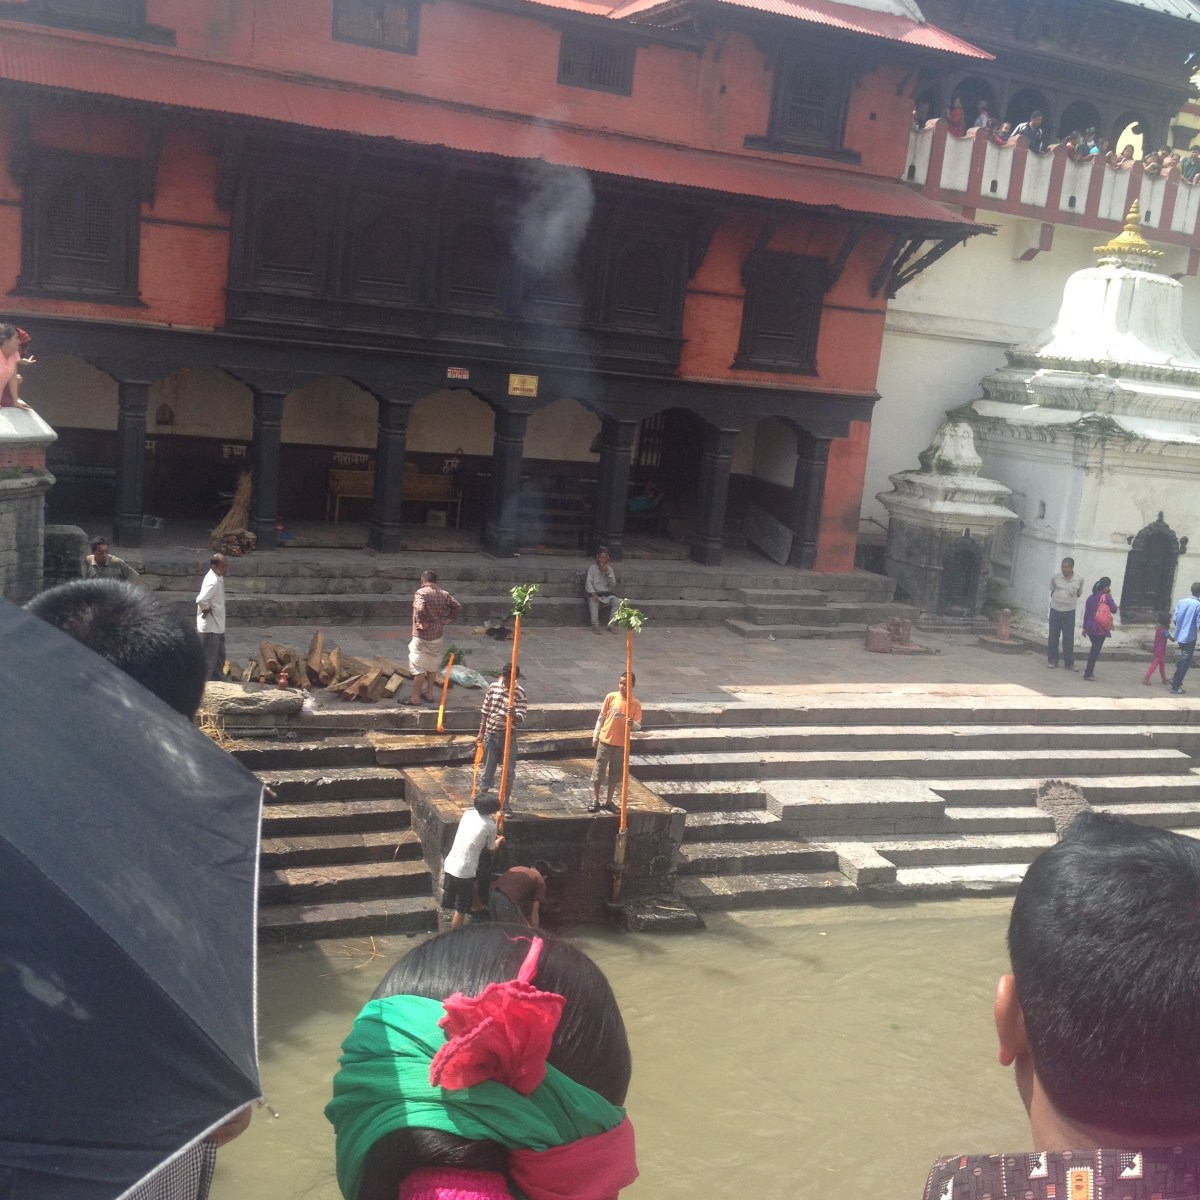 Kathmandu Tourism: The Burning Ghats at Pashupatinath